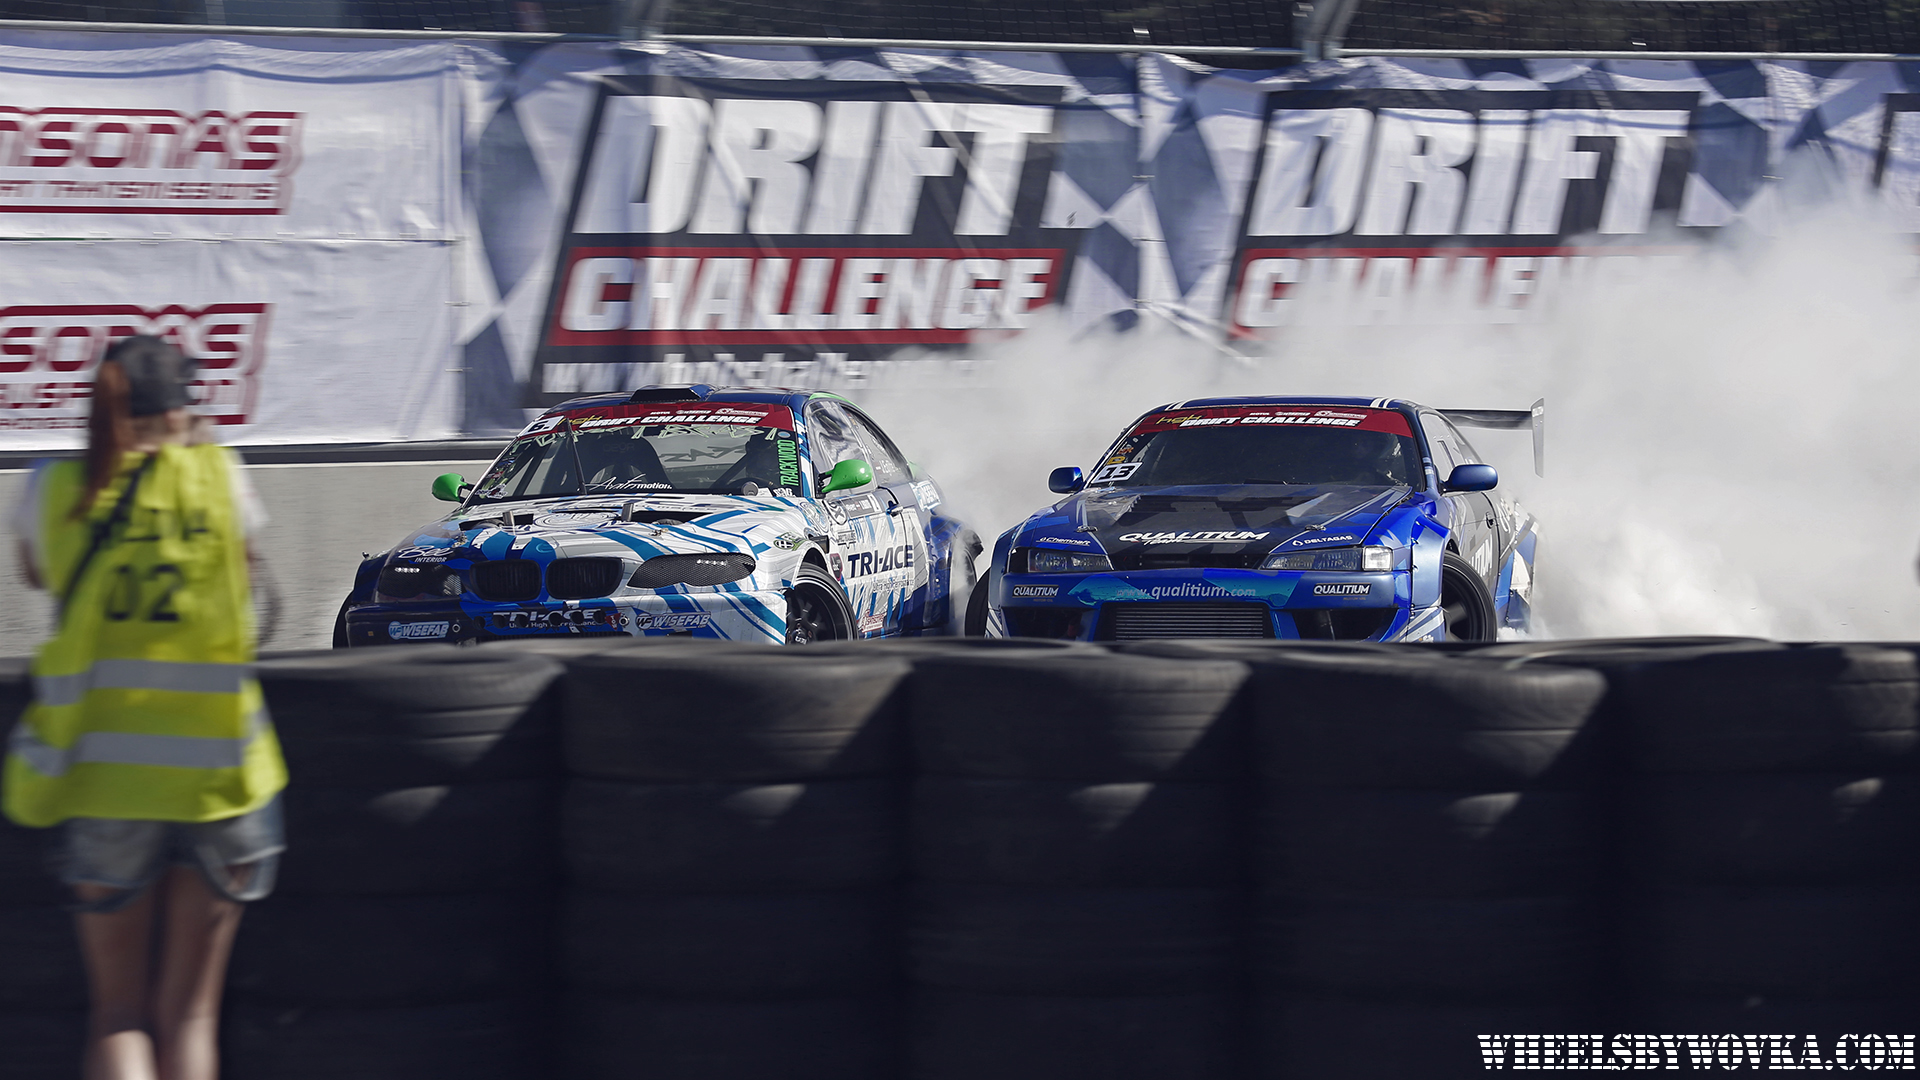 hgk-drift-challenge-2017-by-wheelsbywovka-25